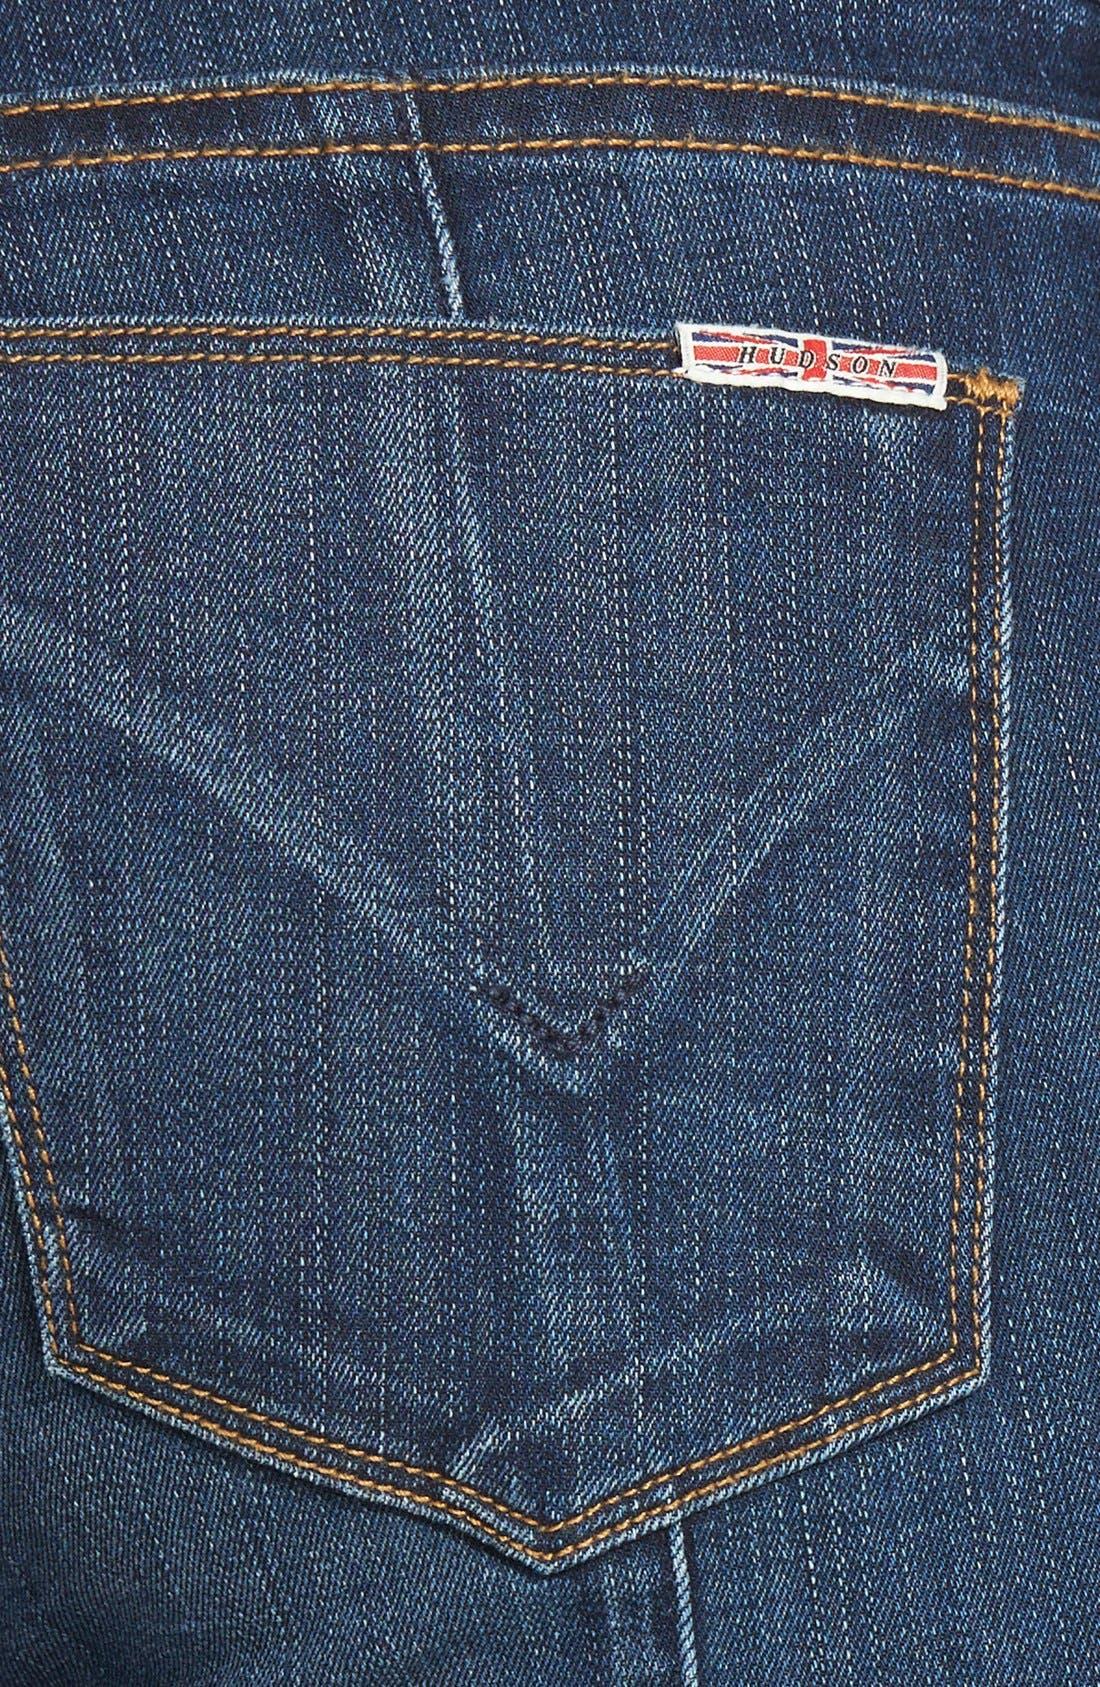 Alternate Image 3  - Hudson Jeans 'Spirit Punk' Zip Detail Skinny Jeans (Globetrotter)